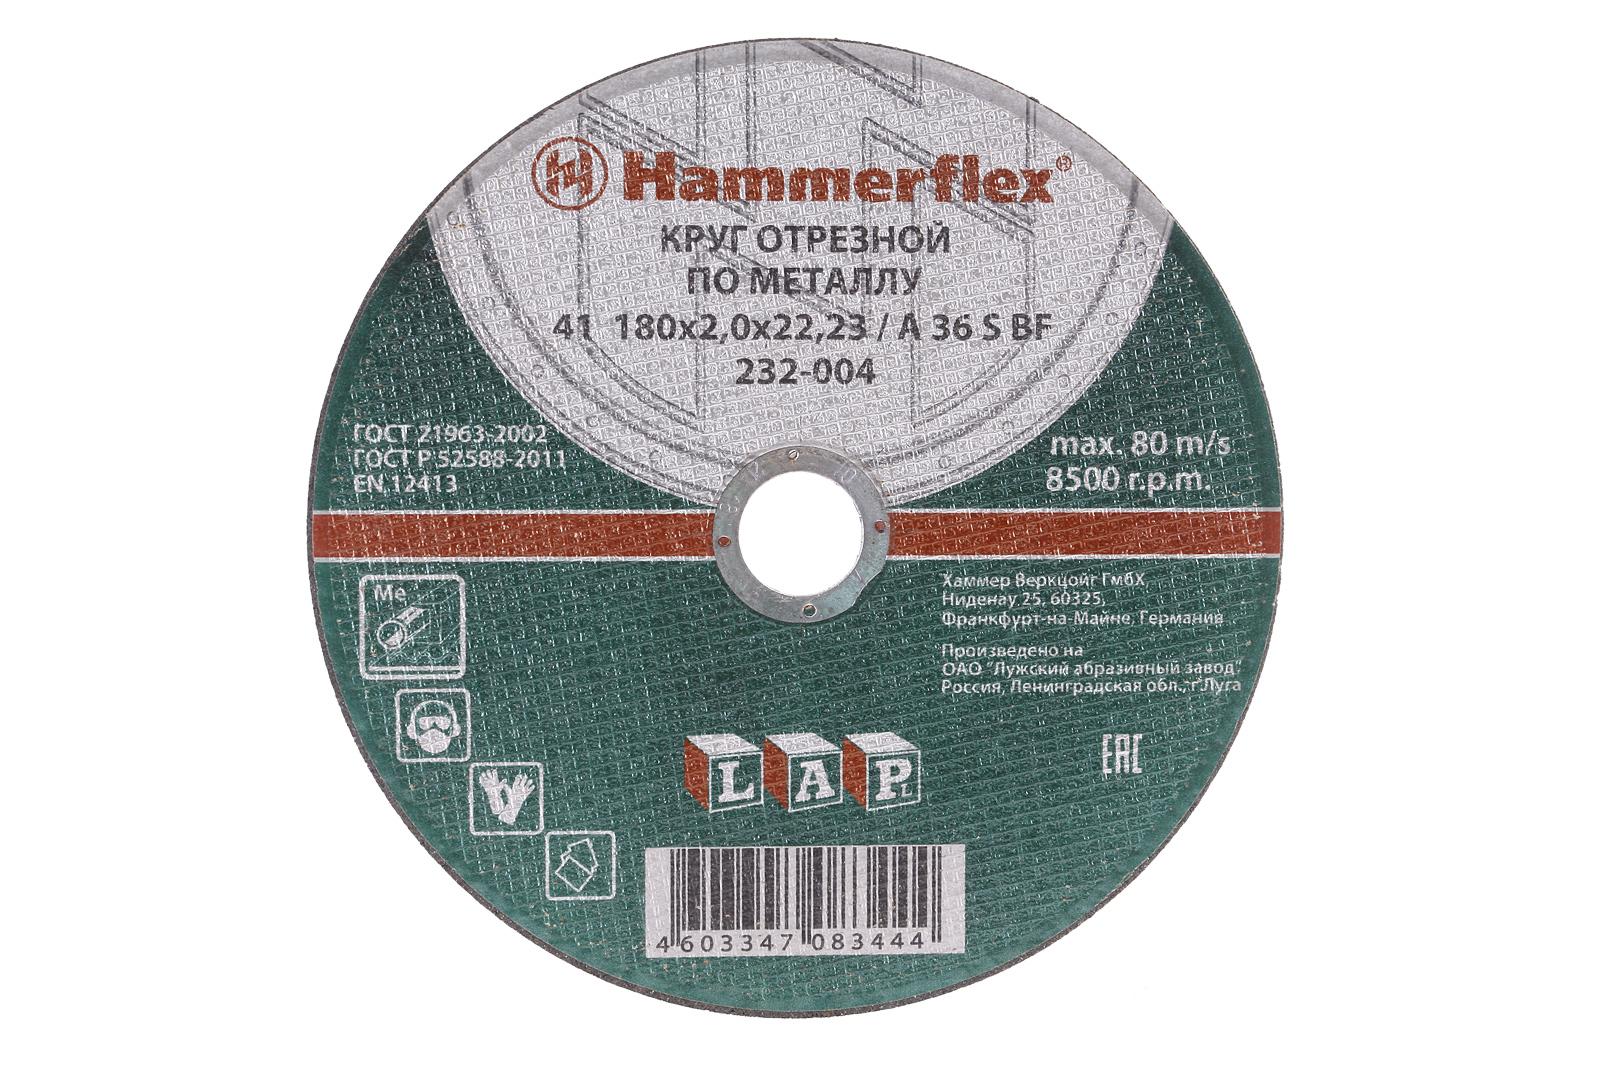 Круг отрезной Hammer 180 x 2.0 x 22 по металлу Коробка (150шт.) круг отрезной hammer 150 x 2 0 x 22 по металлу коробка 200шт